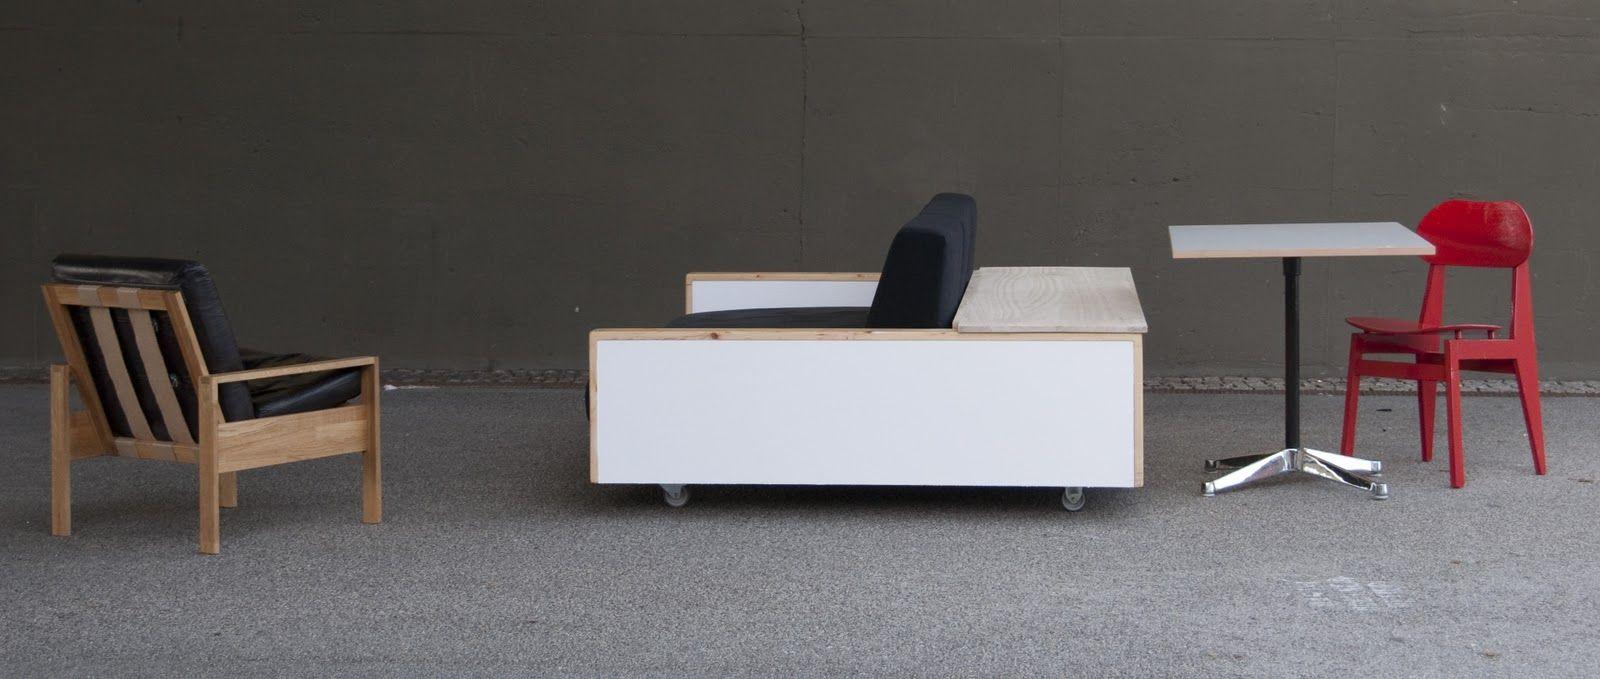 hartz iv m bel siwo sofa criativos sofa couch e m bel. Black Bedroom Furniture Sets. Home Design Ideas